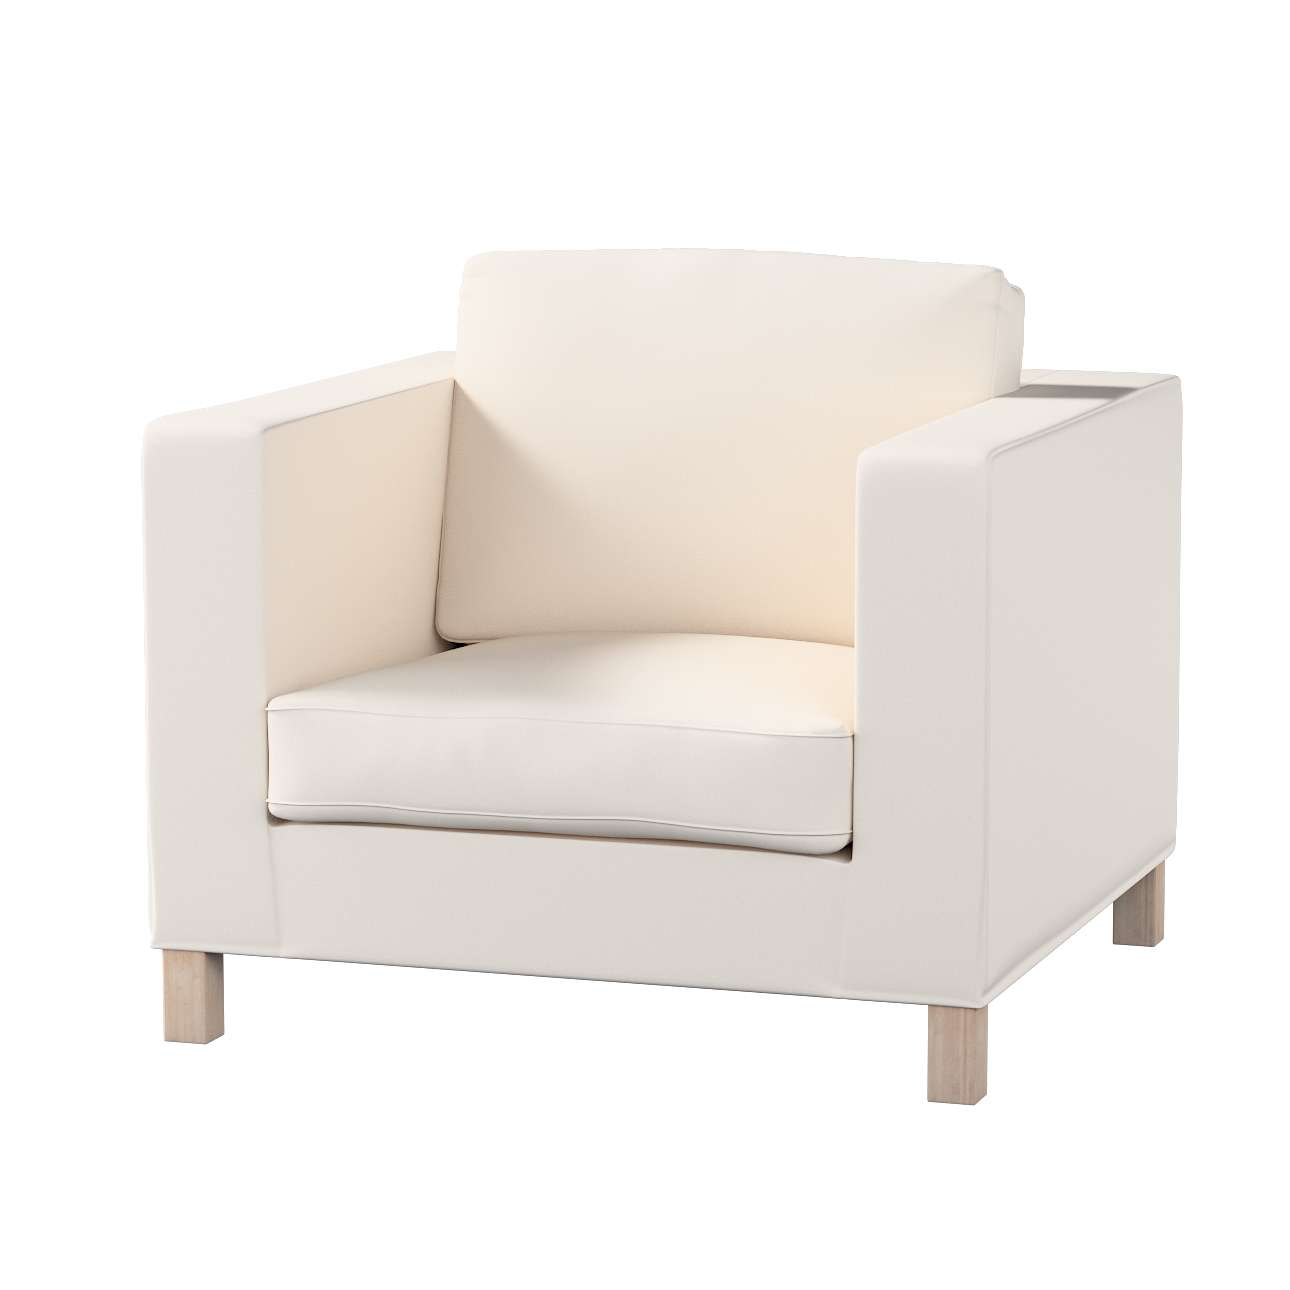 Pokrowiec na fotel Karlanda, krótki fotel Karlanda w kolekcji Etna , tkanina: 705-01